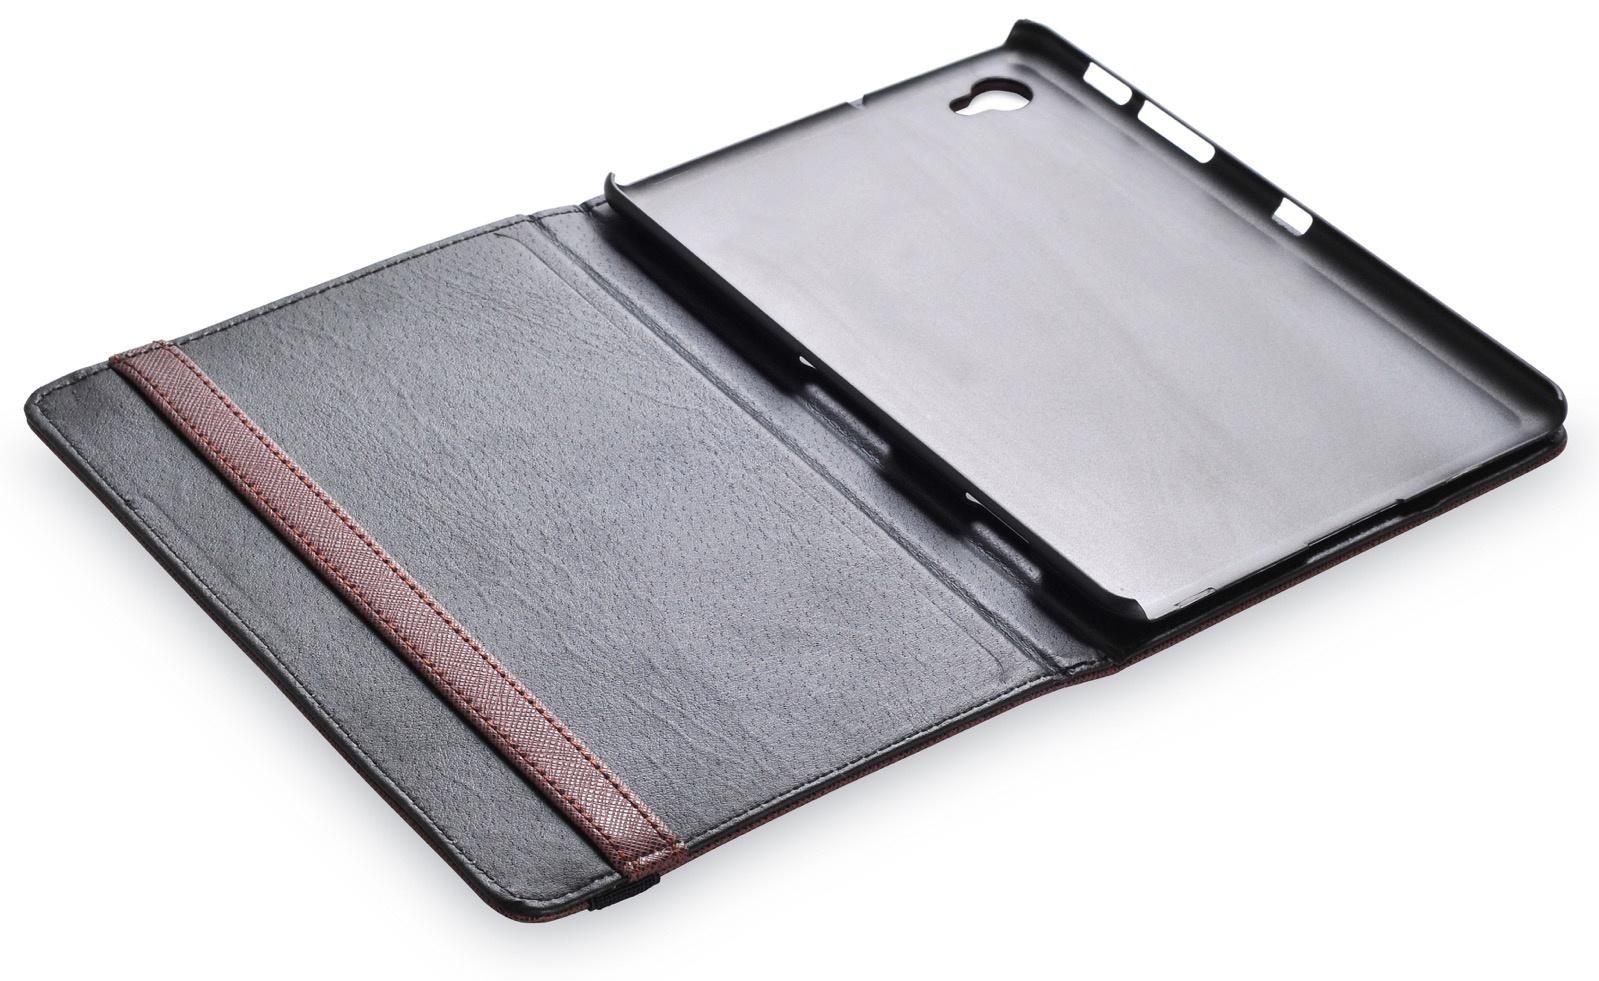 "Чехол для планшета iNeez книжка эко кожа для Samsung Galaxy Tab 7.7"", коричневый"